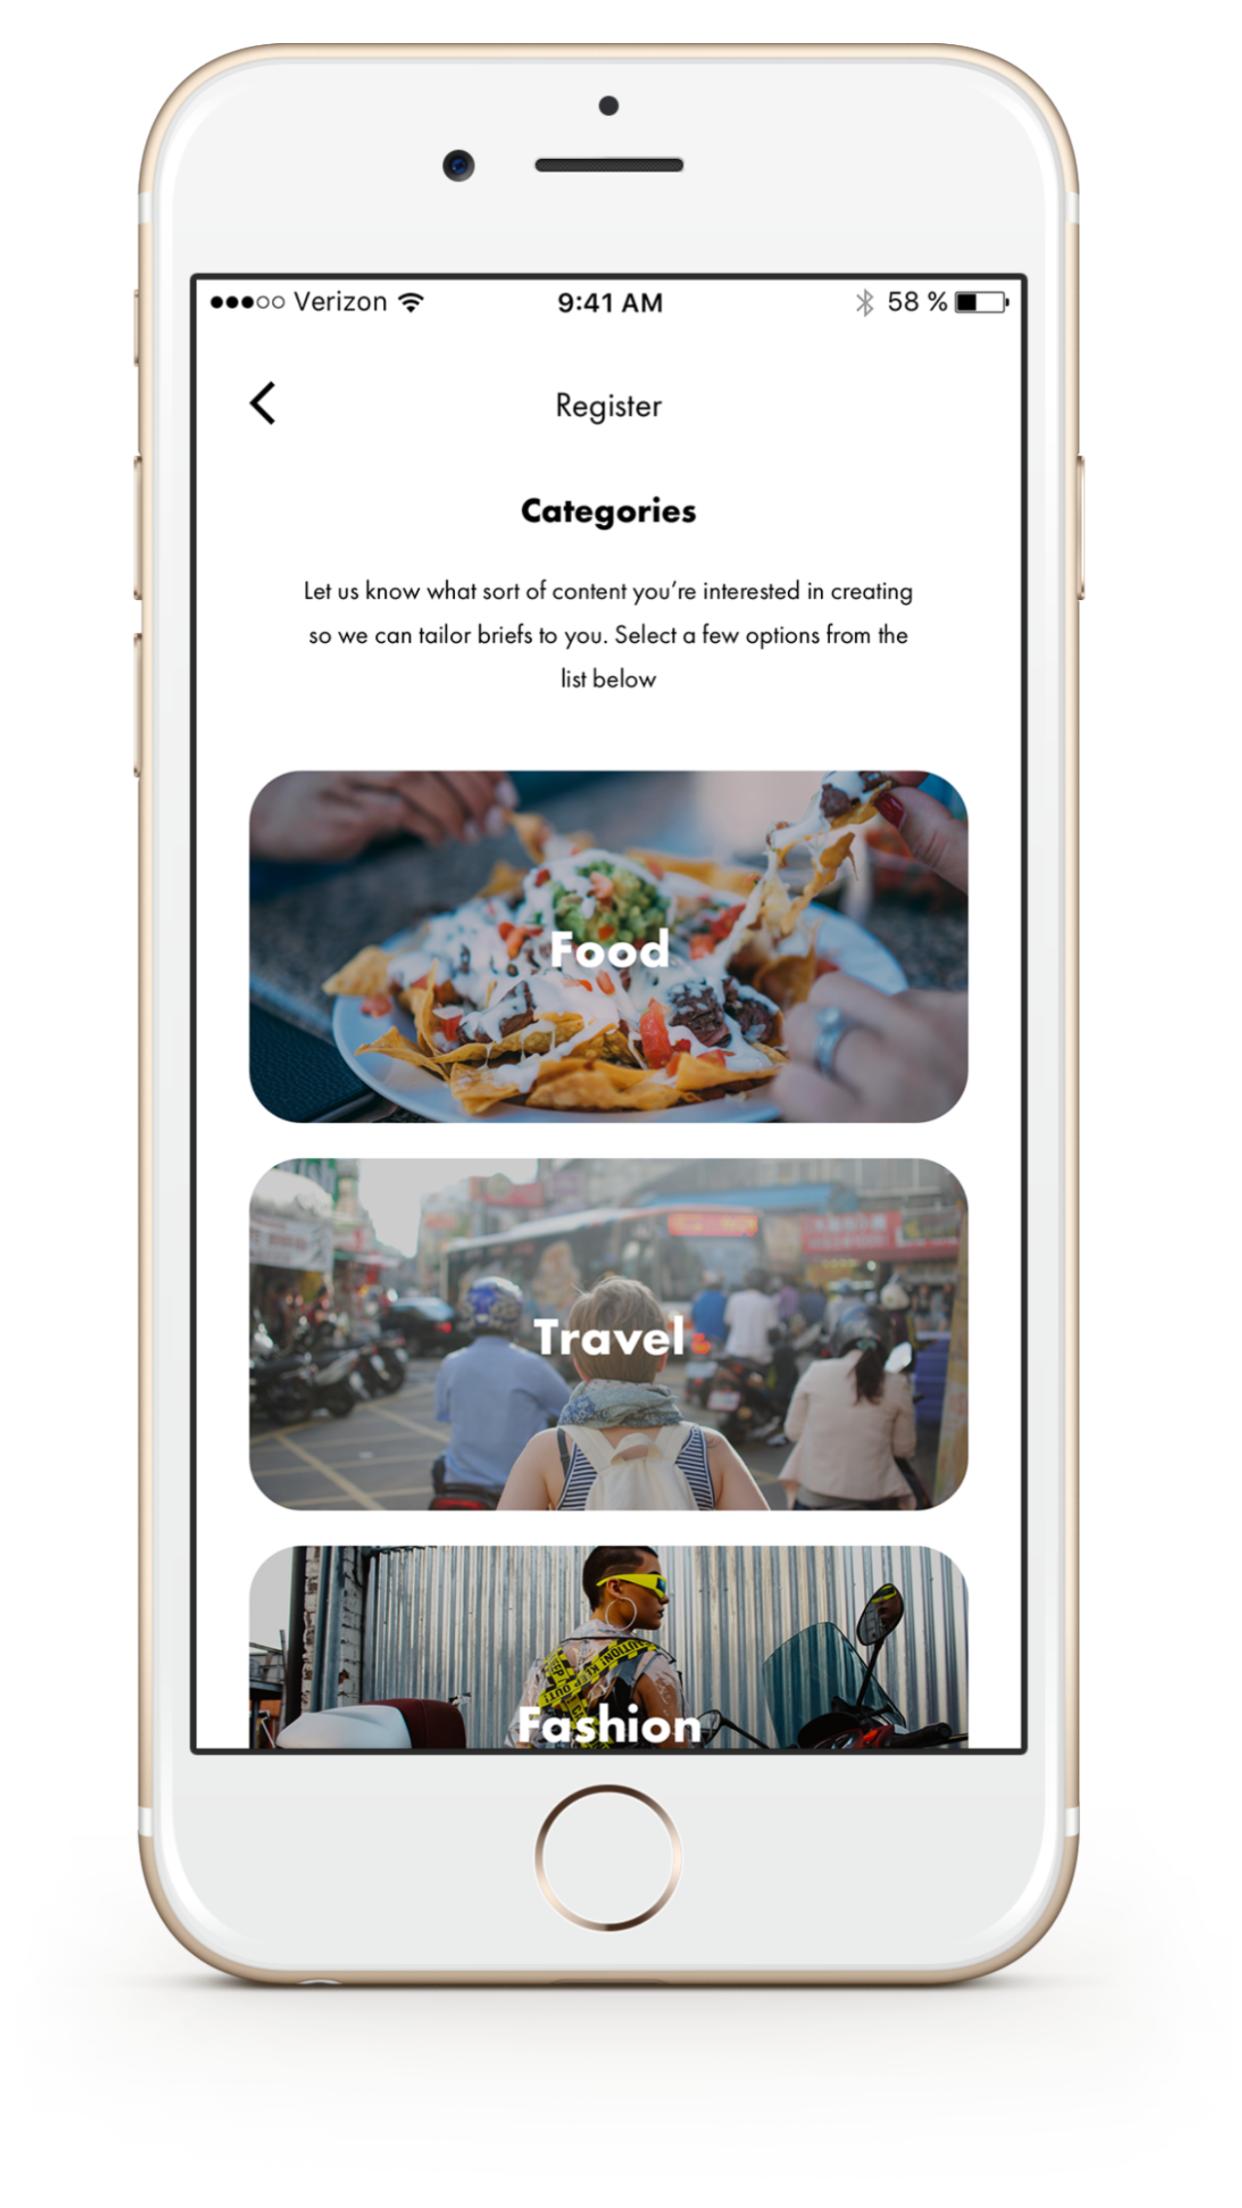 iphone-snapr-for-creators-screeshot-categories.png